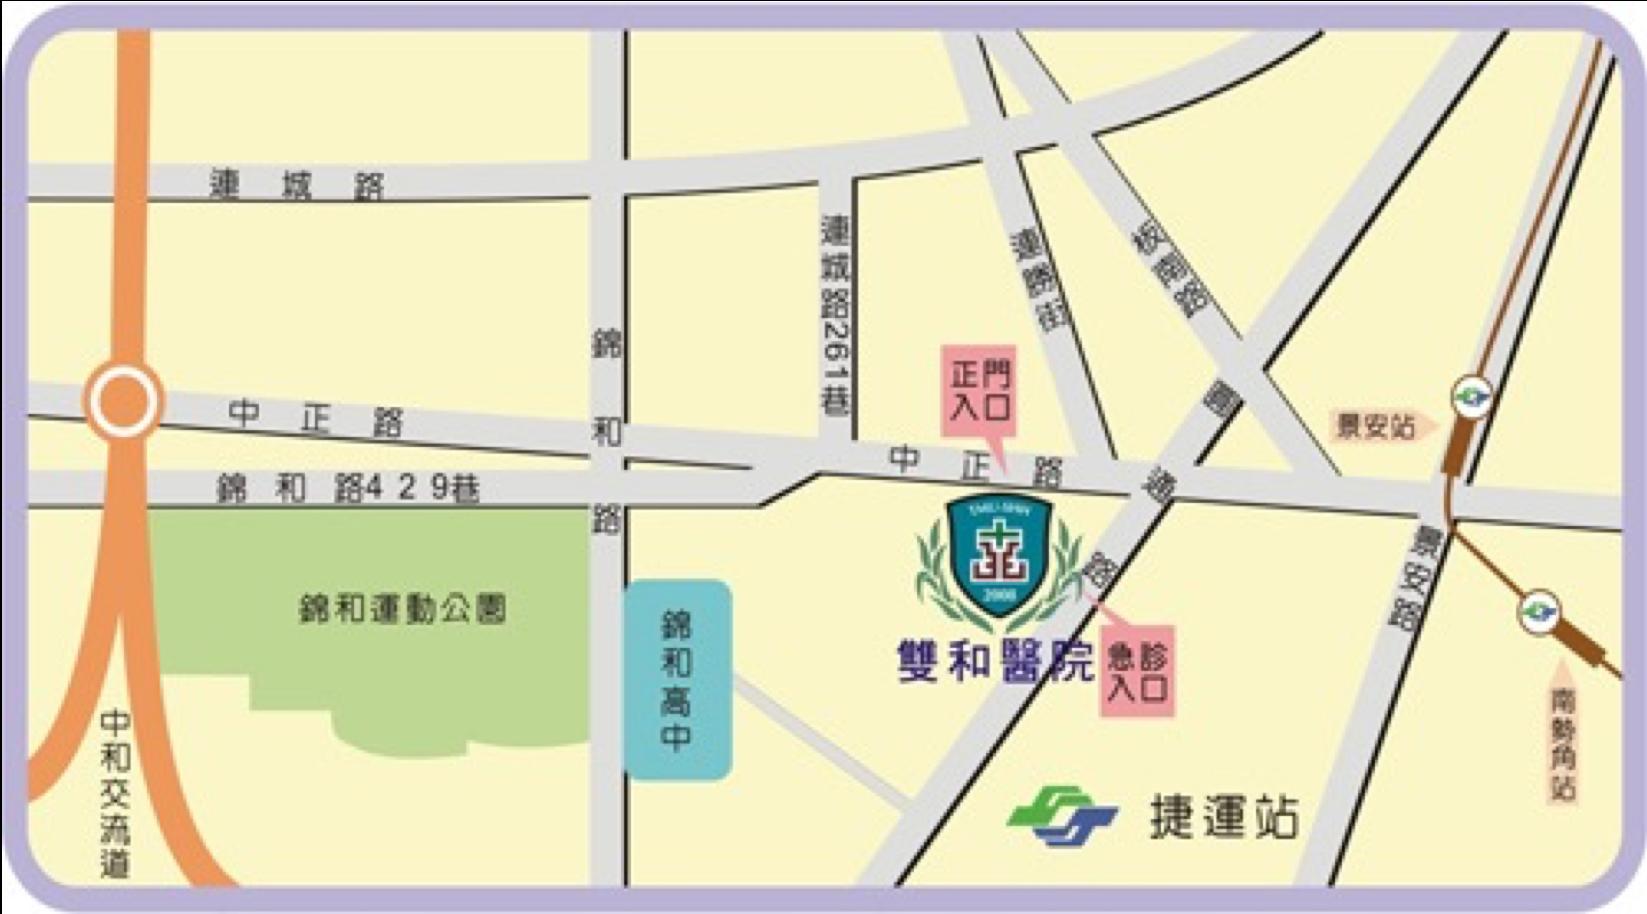 雙和醫院map